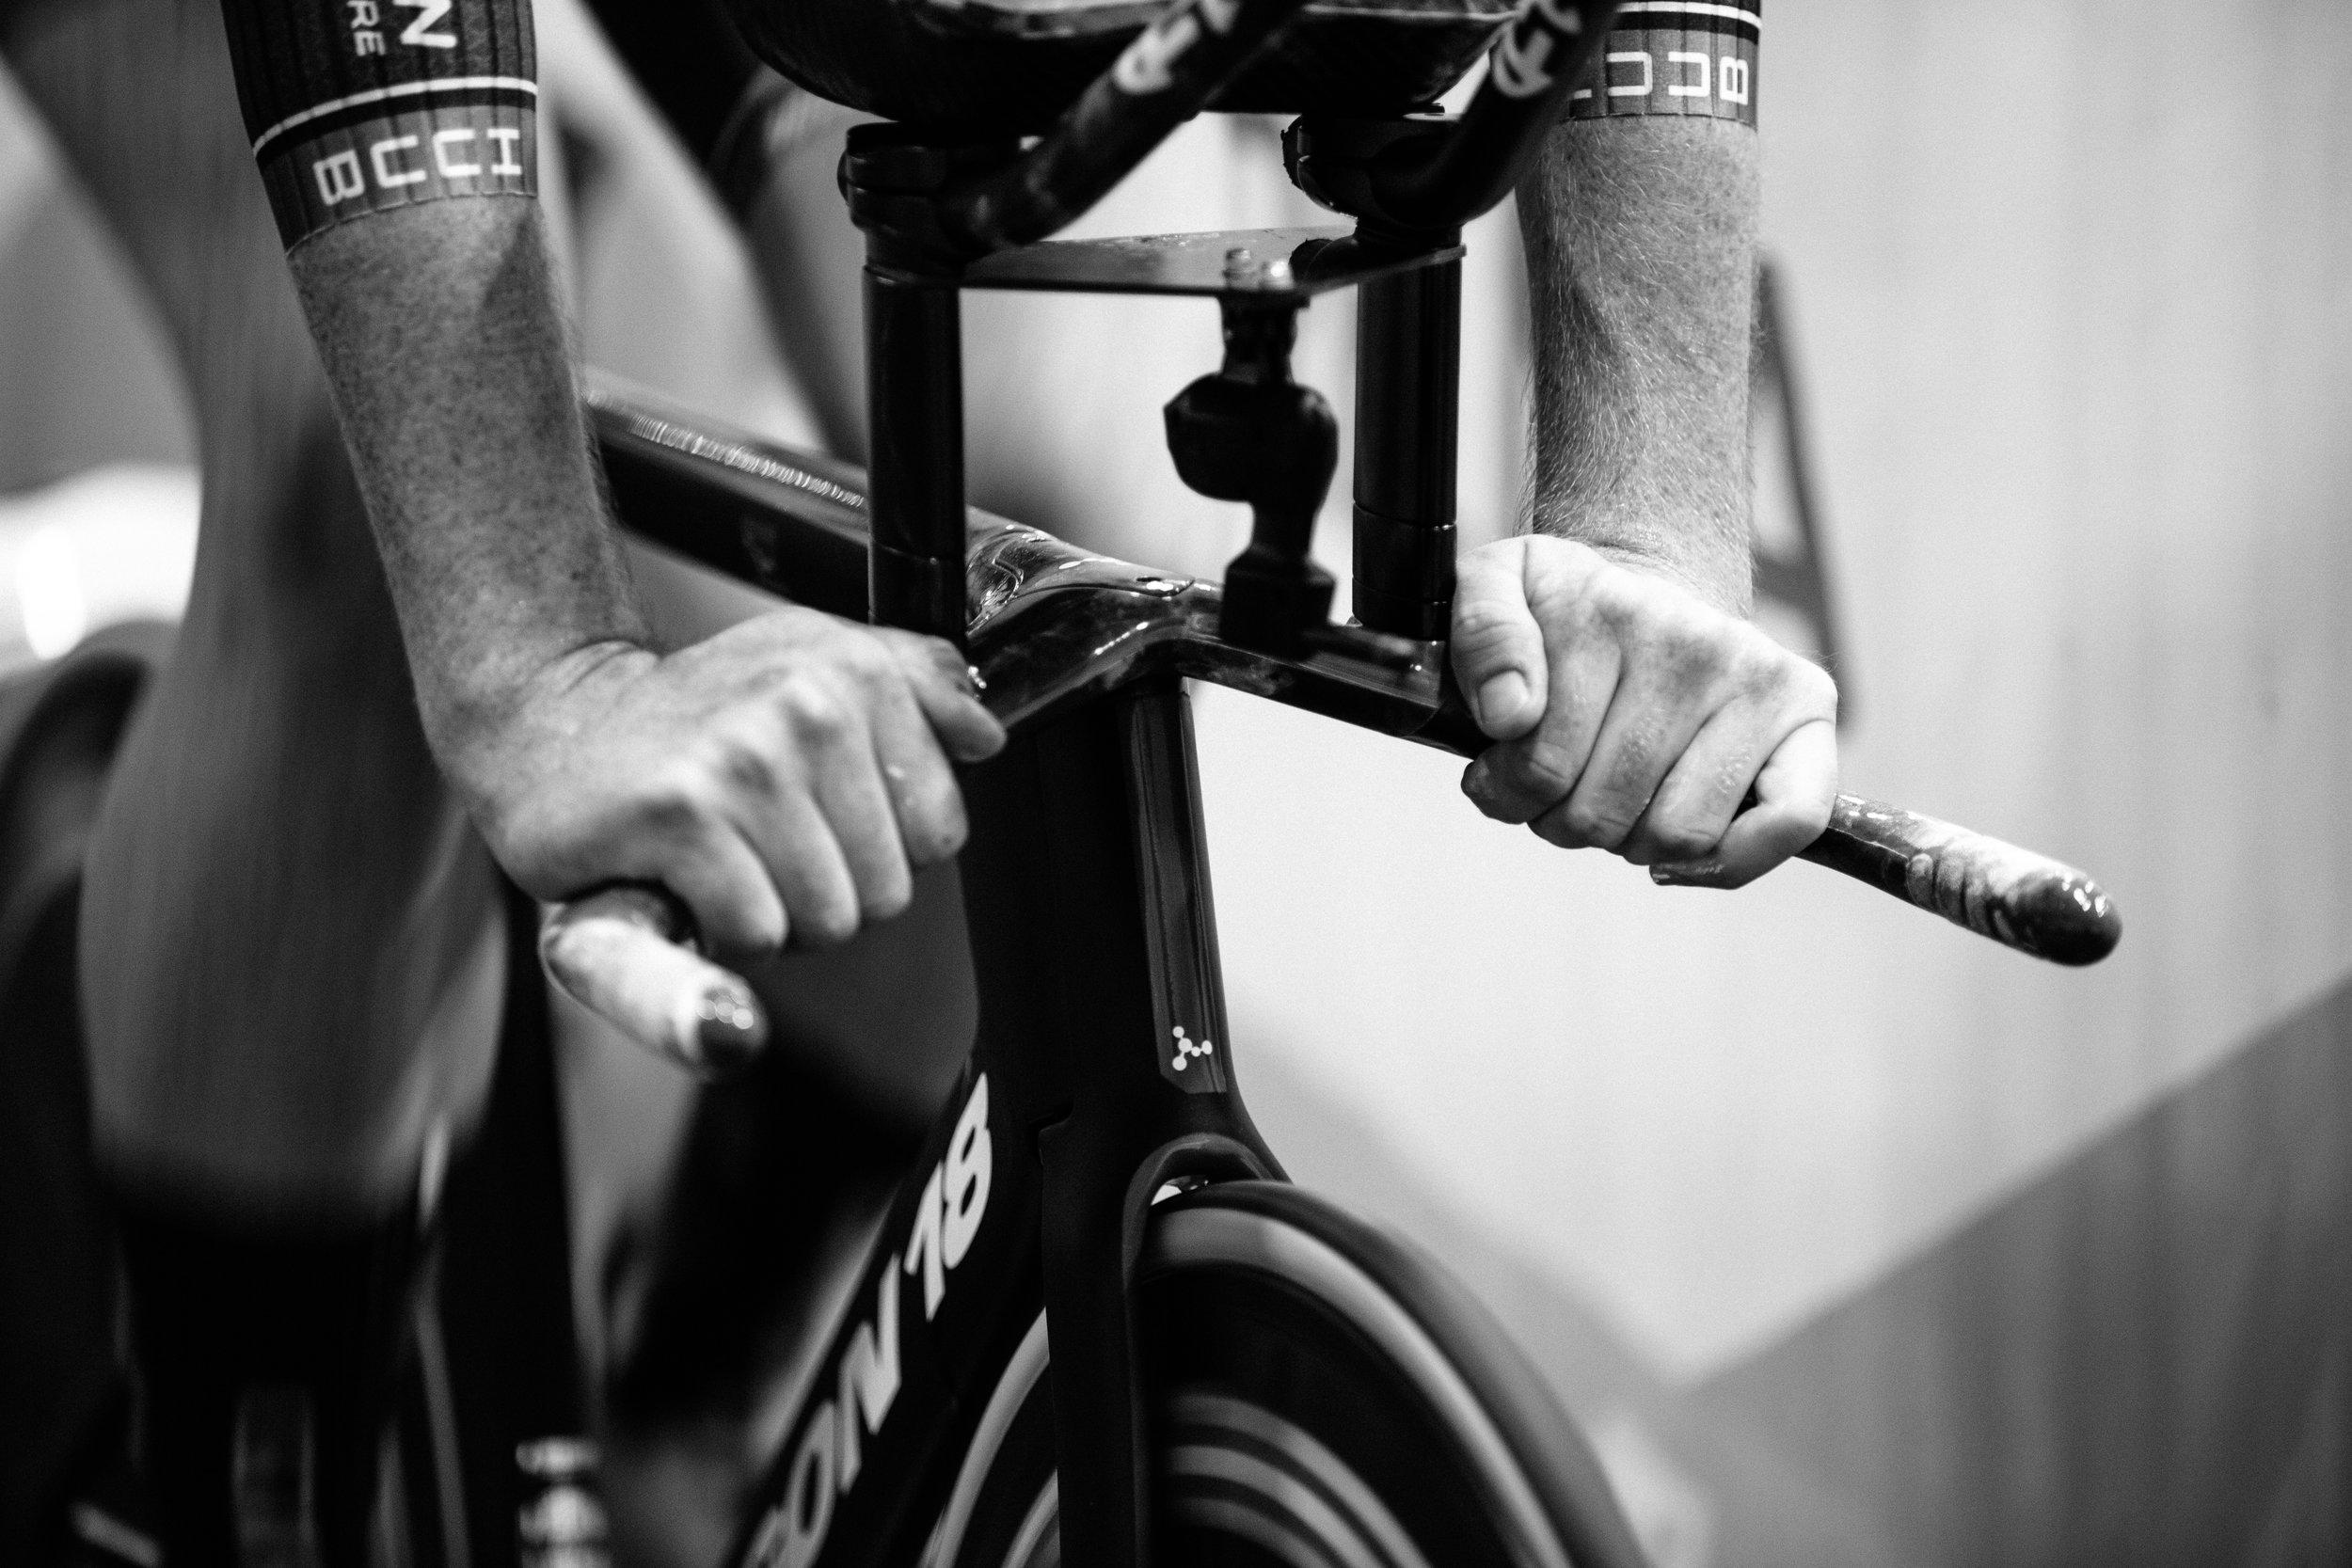 derby-velodrome-123.jpg